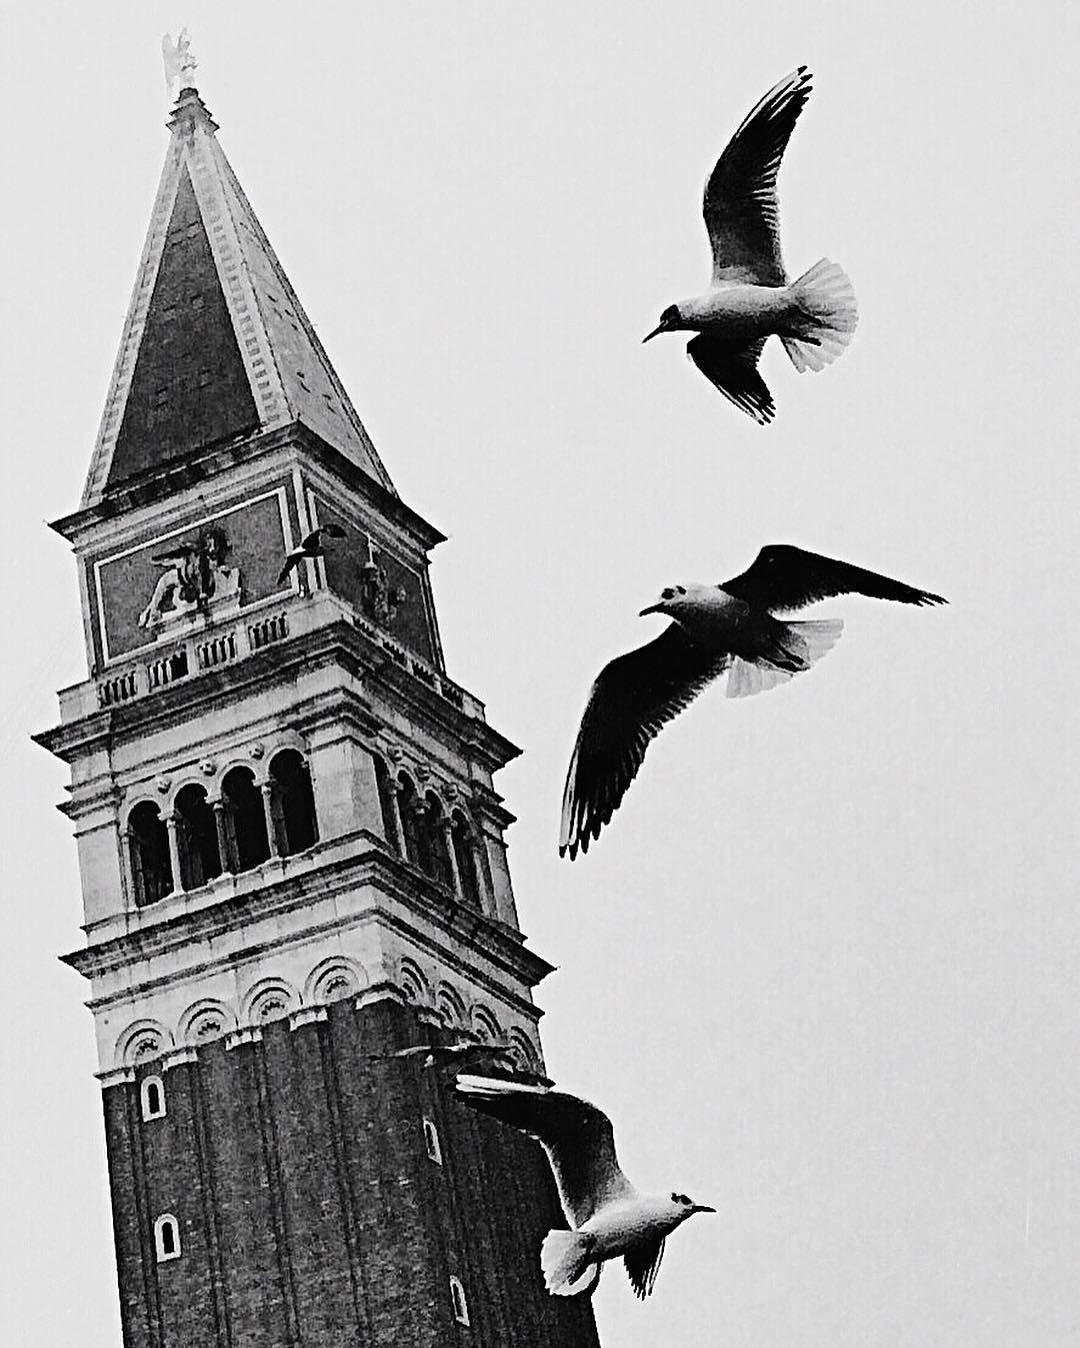 Arrivai a Venezia in un giorno di pioggia alzai gli occhi e capii che stavo sognando #venezia #venice #ig_venice #ig_venezia #igersvenezia #monochromatic #monochrome #noir #blackandwhite #bw #bw_lover #bwlovers #bwstyleoftheday #bwstyleoftheday #atmosfera #atmosphere  #capture #capture_today #campaniledisanmarco #piazzasanmarco #bird #gabbiano #fly #sogno #tempo #adorovenezia #instabw #instavenice #instagood by ve_bub